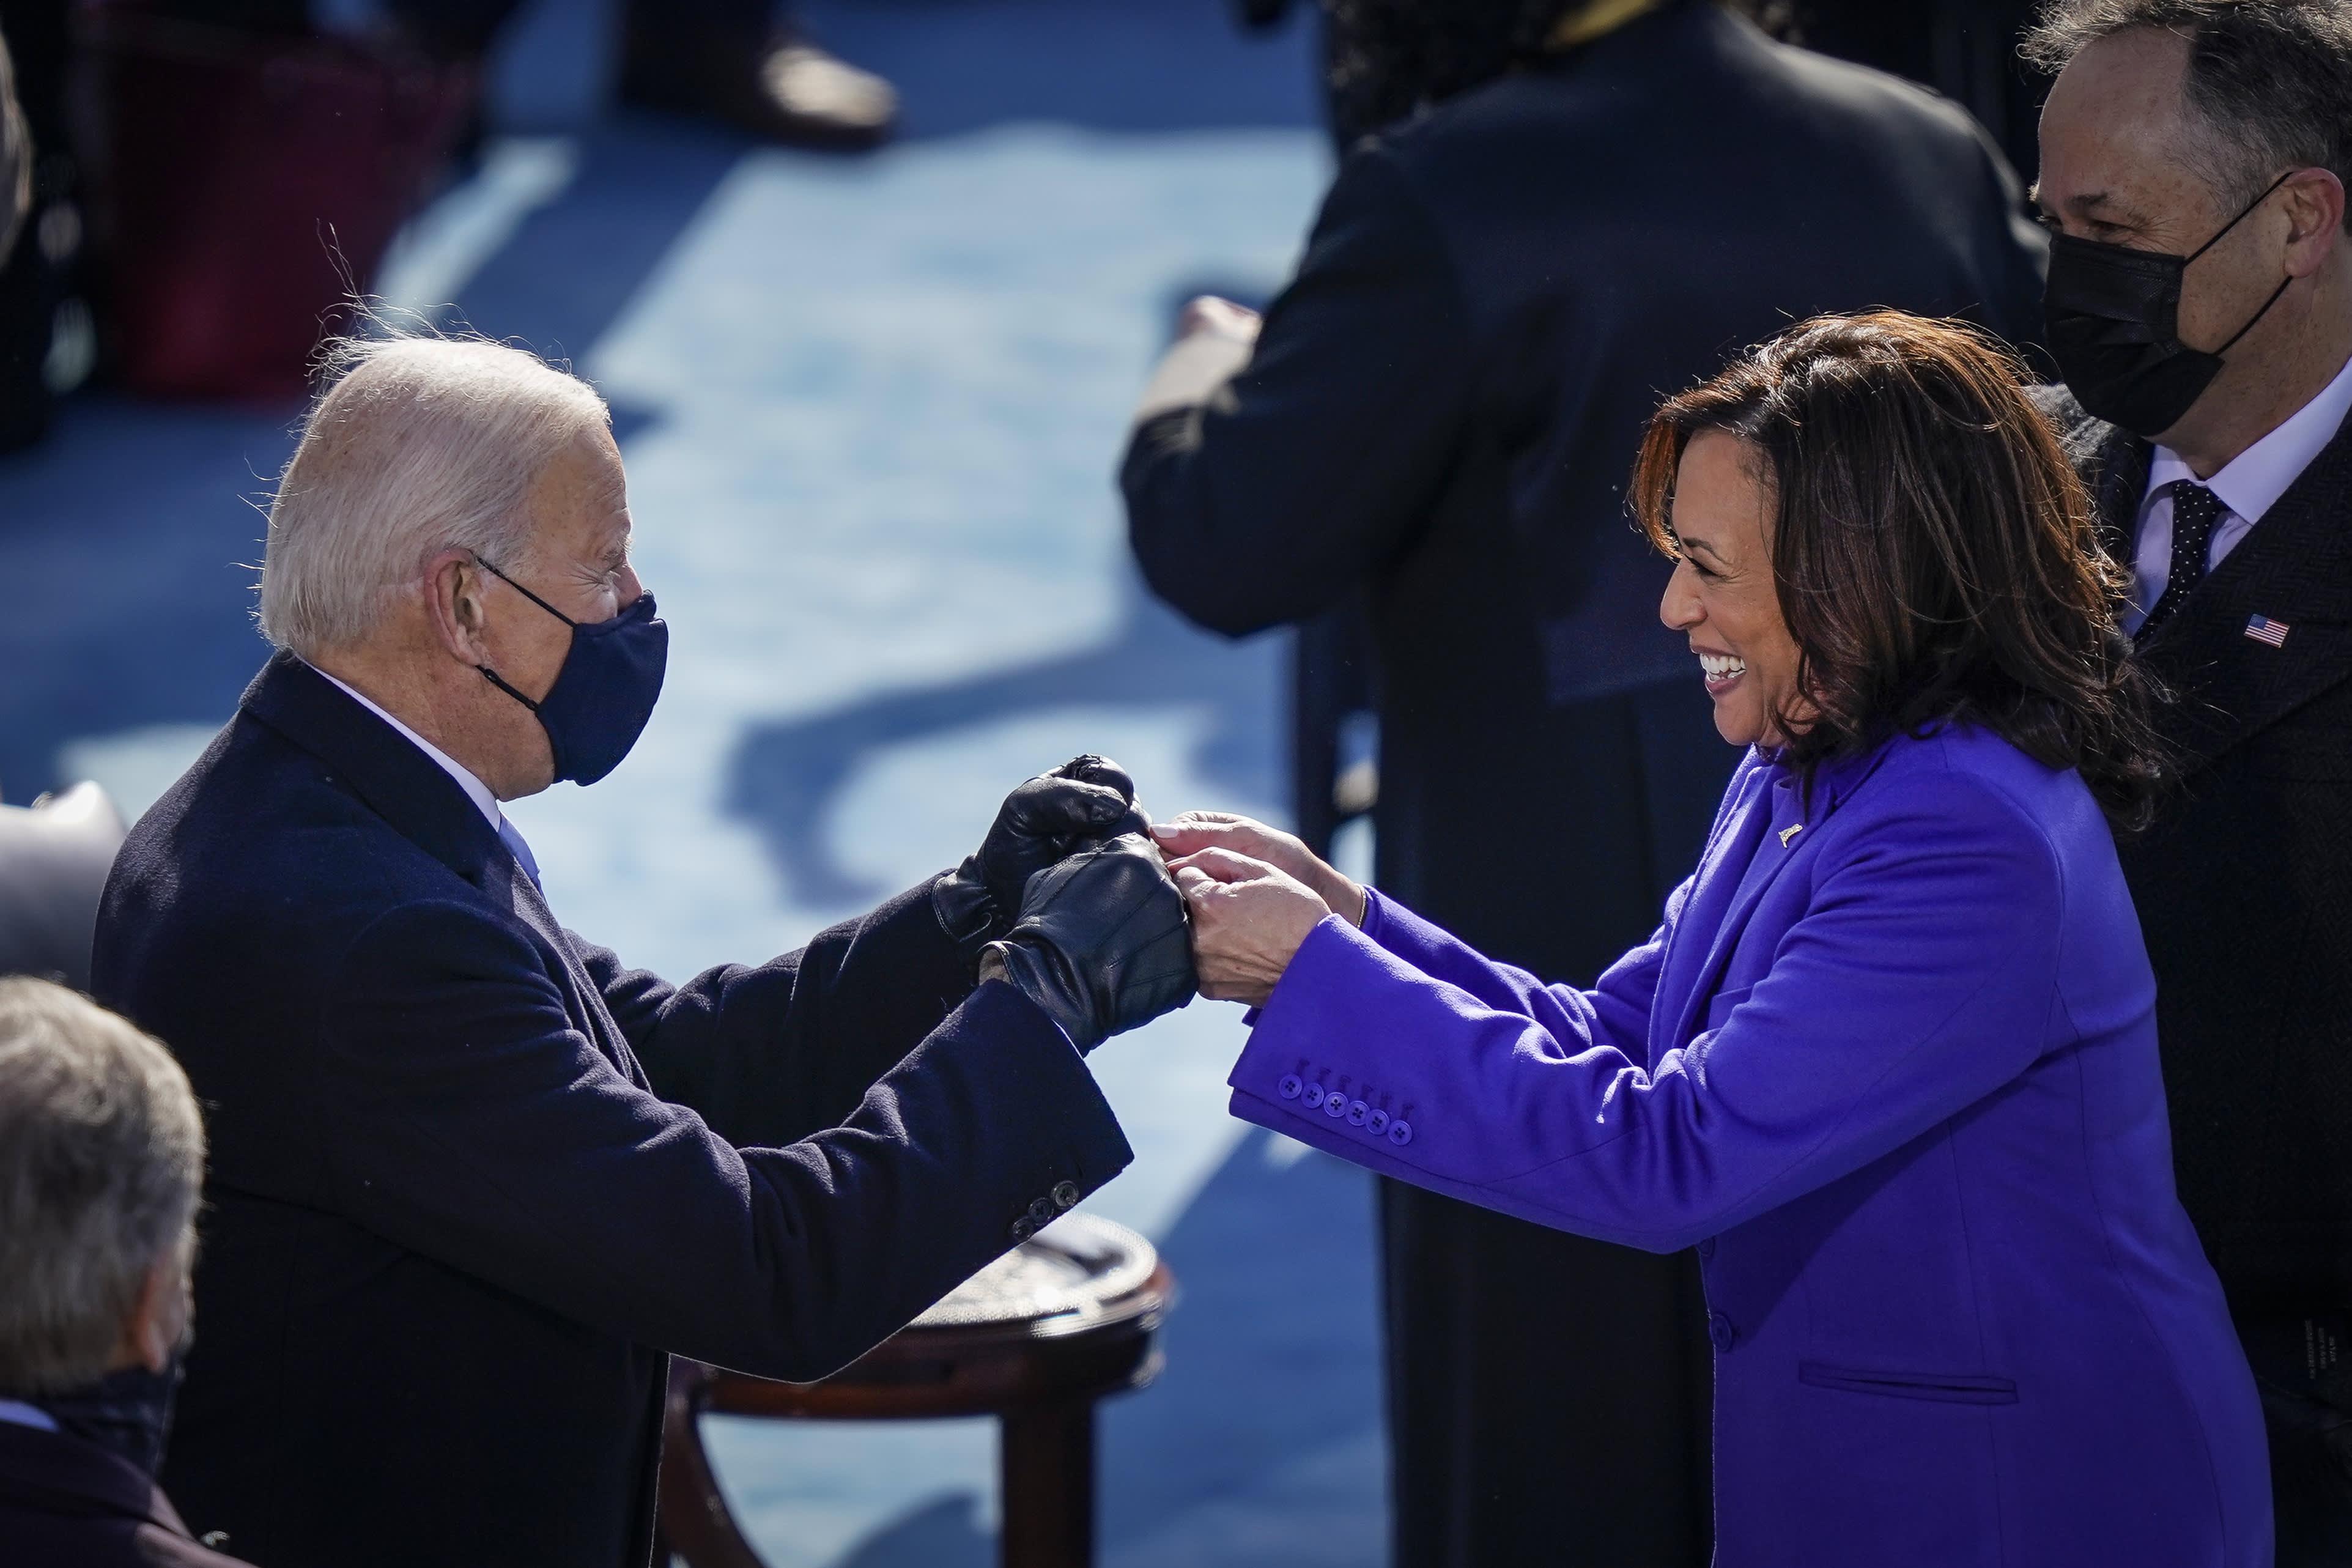 'New daybreak in America': World leaders welcome U.S. President Joe Biden and Vice President Kamala Harris